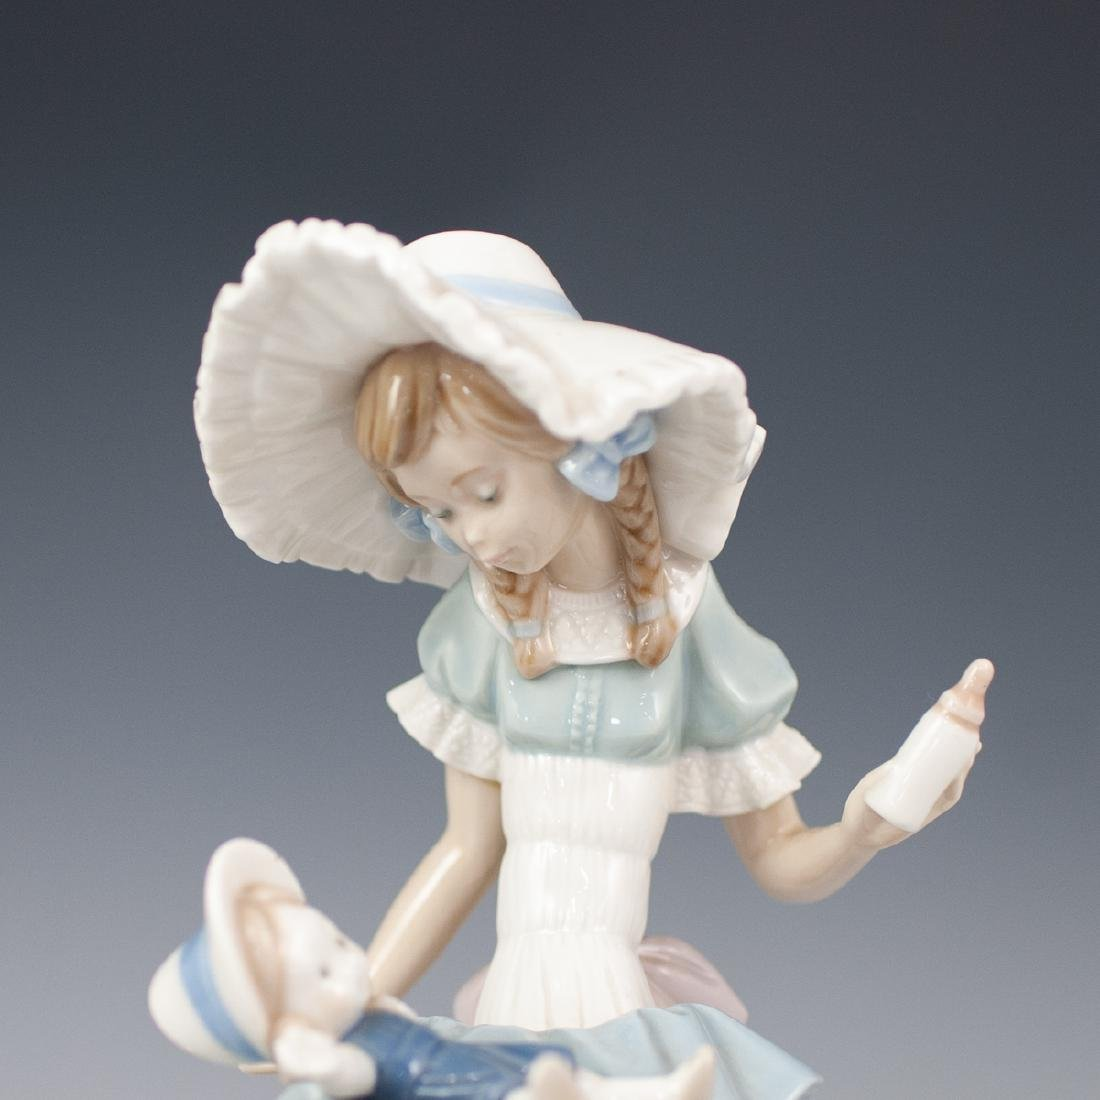 Pair Of Lladro Porcelain Figurines - 2